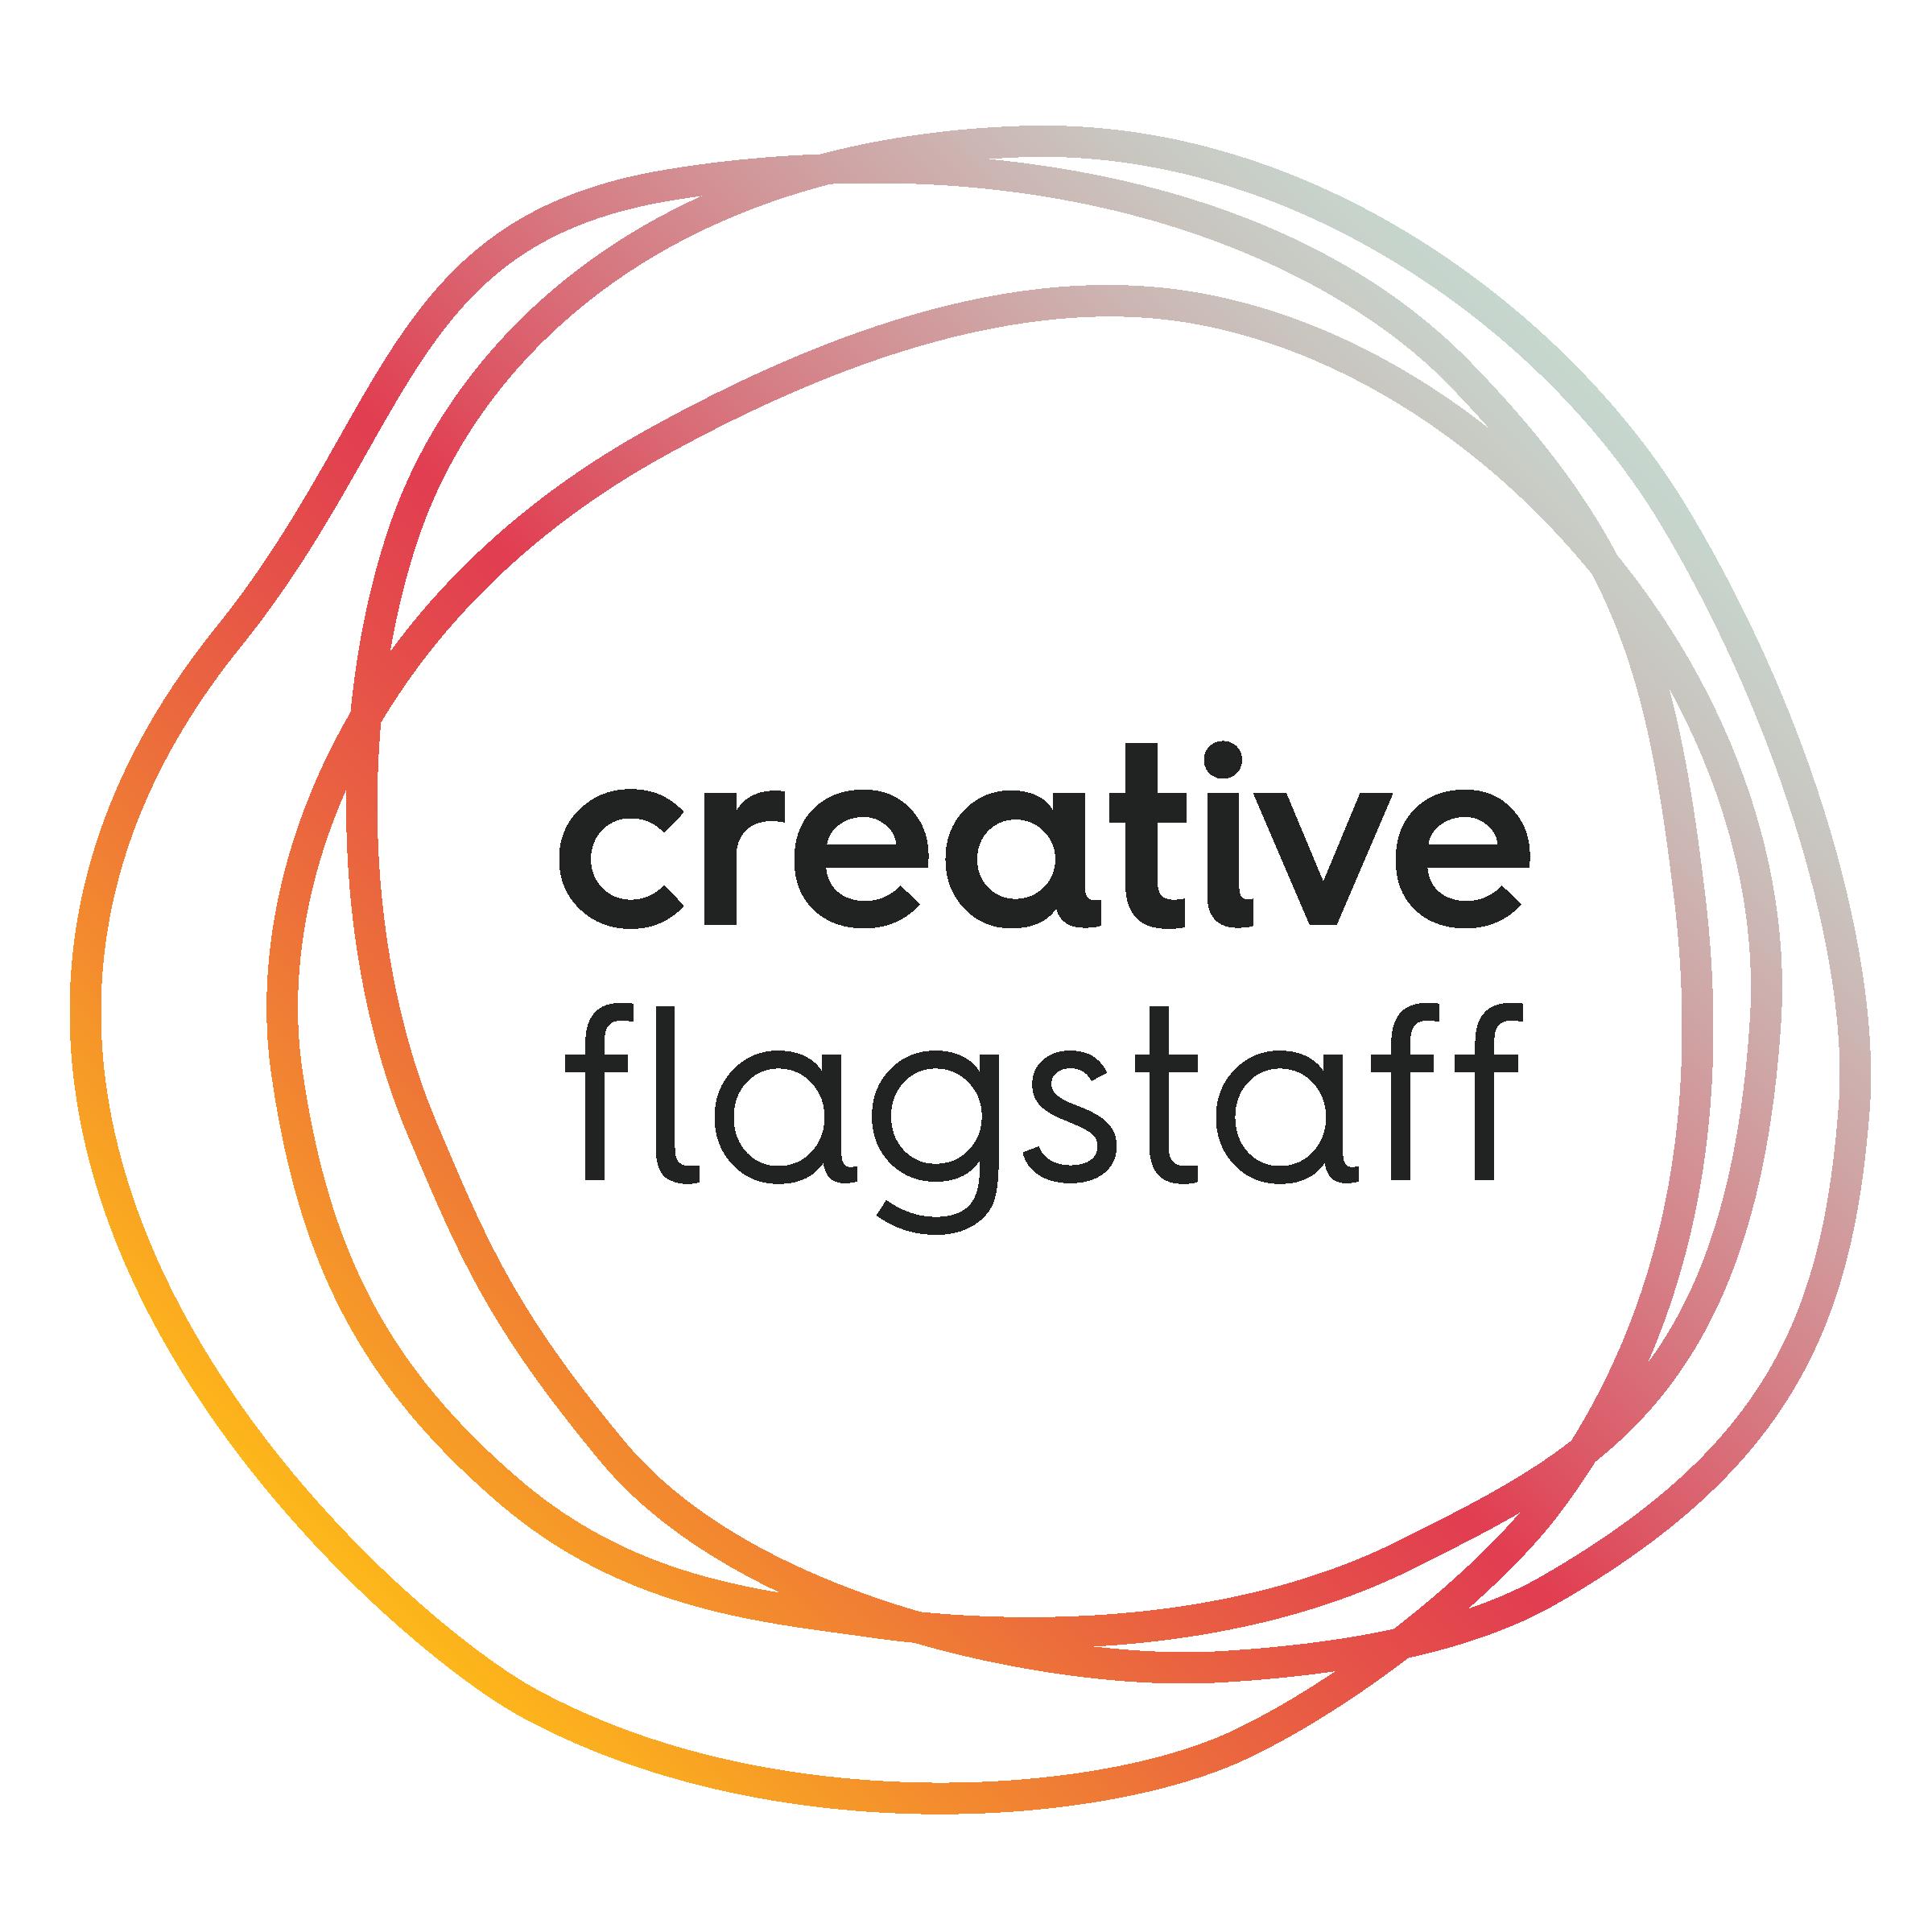 Creative Flagstaff   Where Arts, Science & Culture Converge